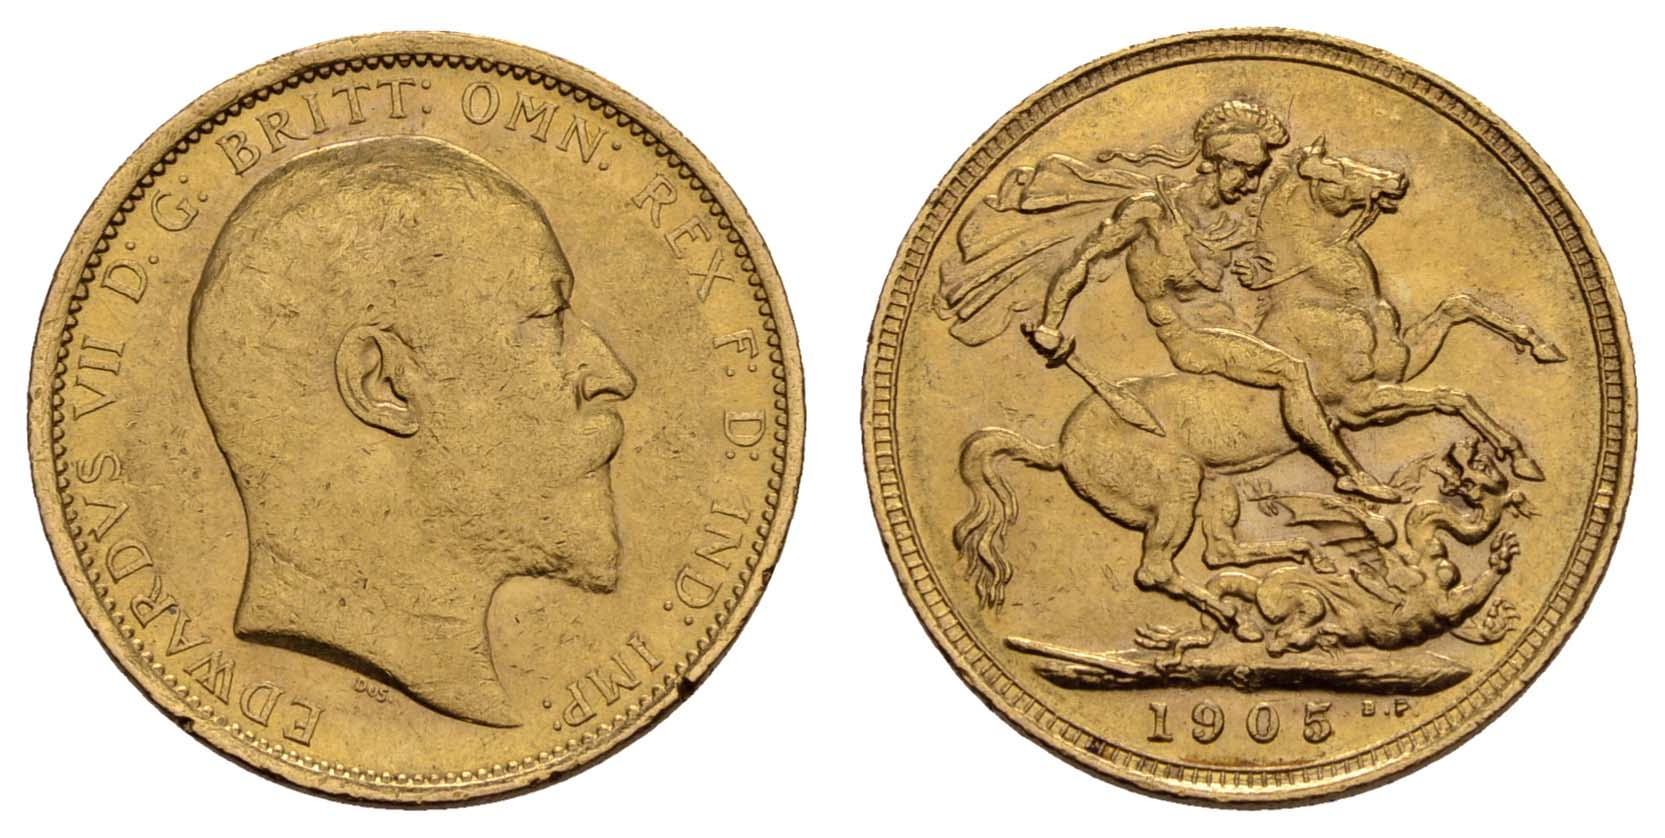 Lot 1860 - übersee australien -  Auktionshaus Ulrich Felzmann GmbH & Co. KG Coins single lots